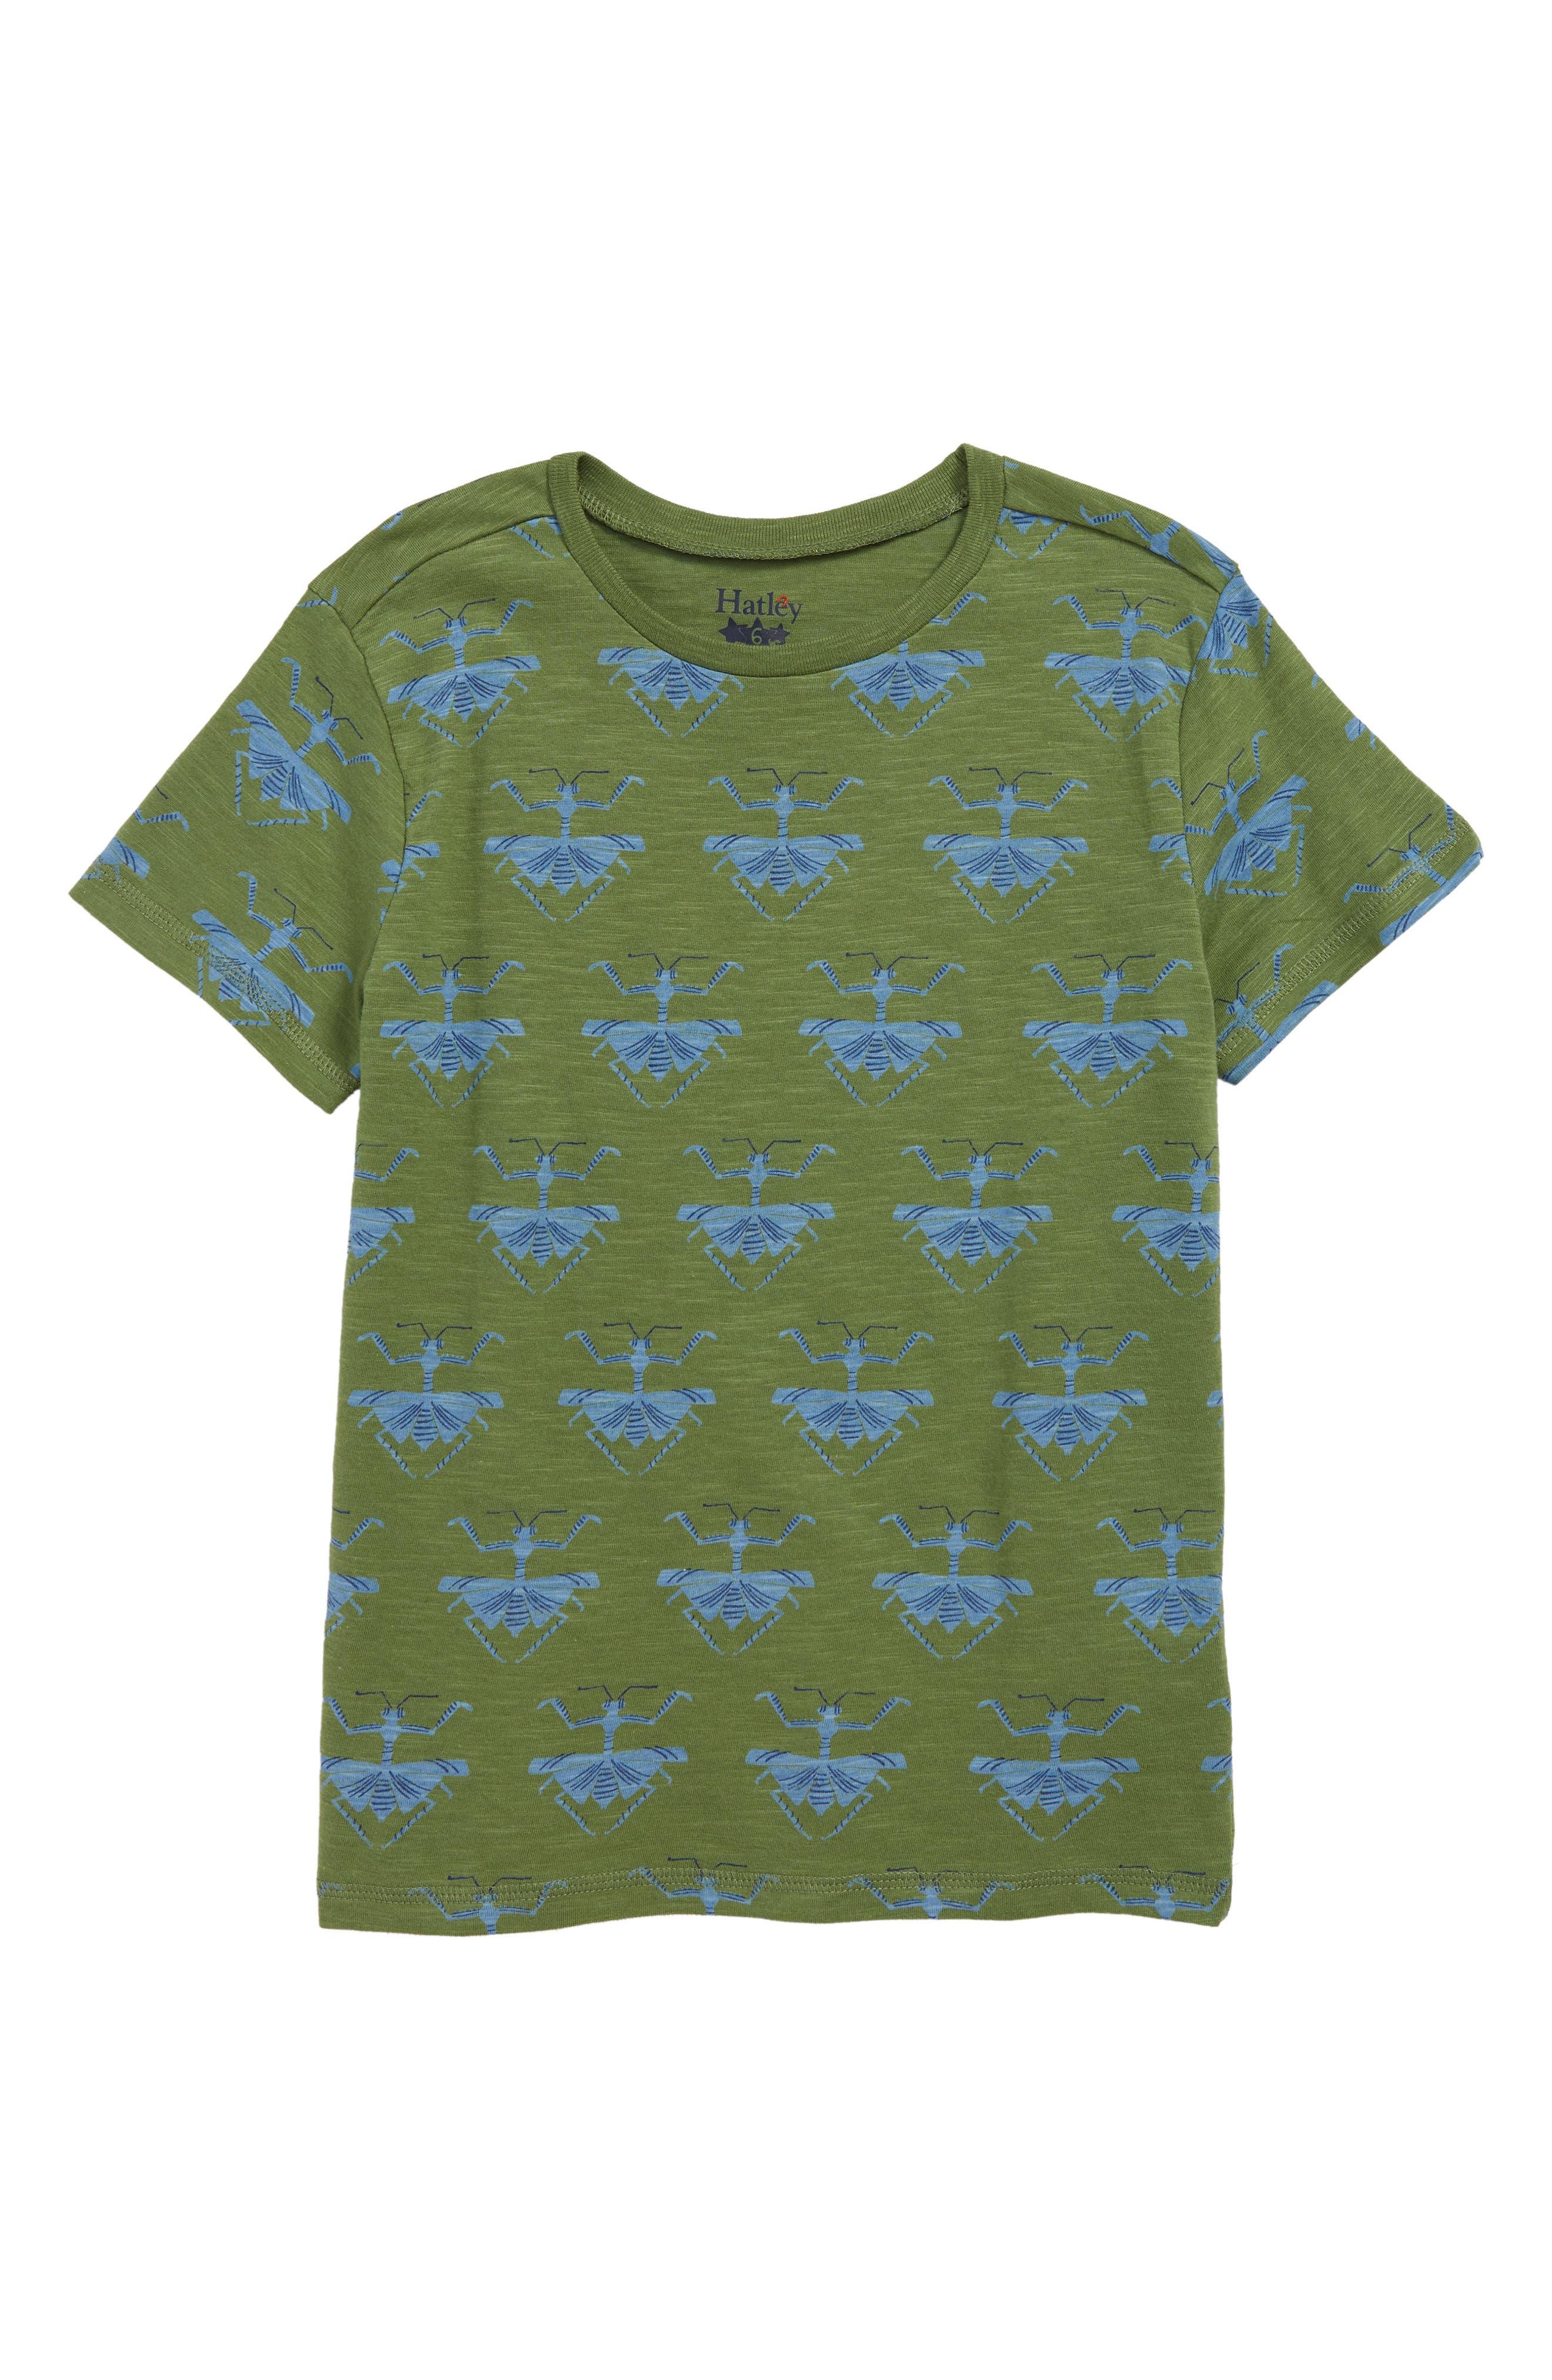 HATLEY Mantises Graphic T-Shirt, Main, color, GREEN